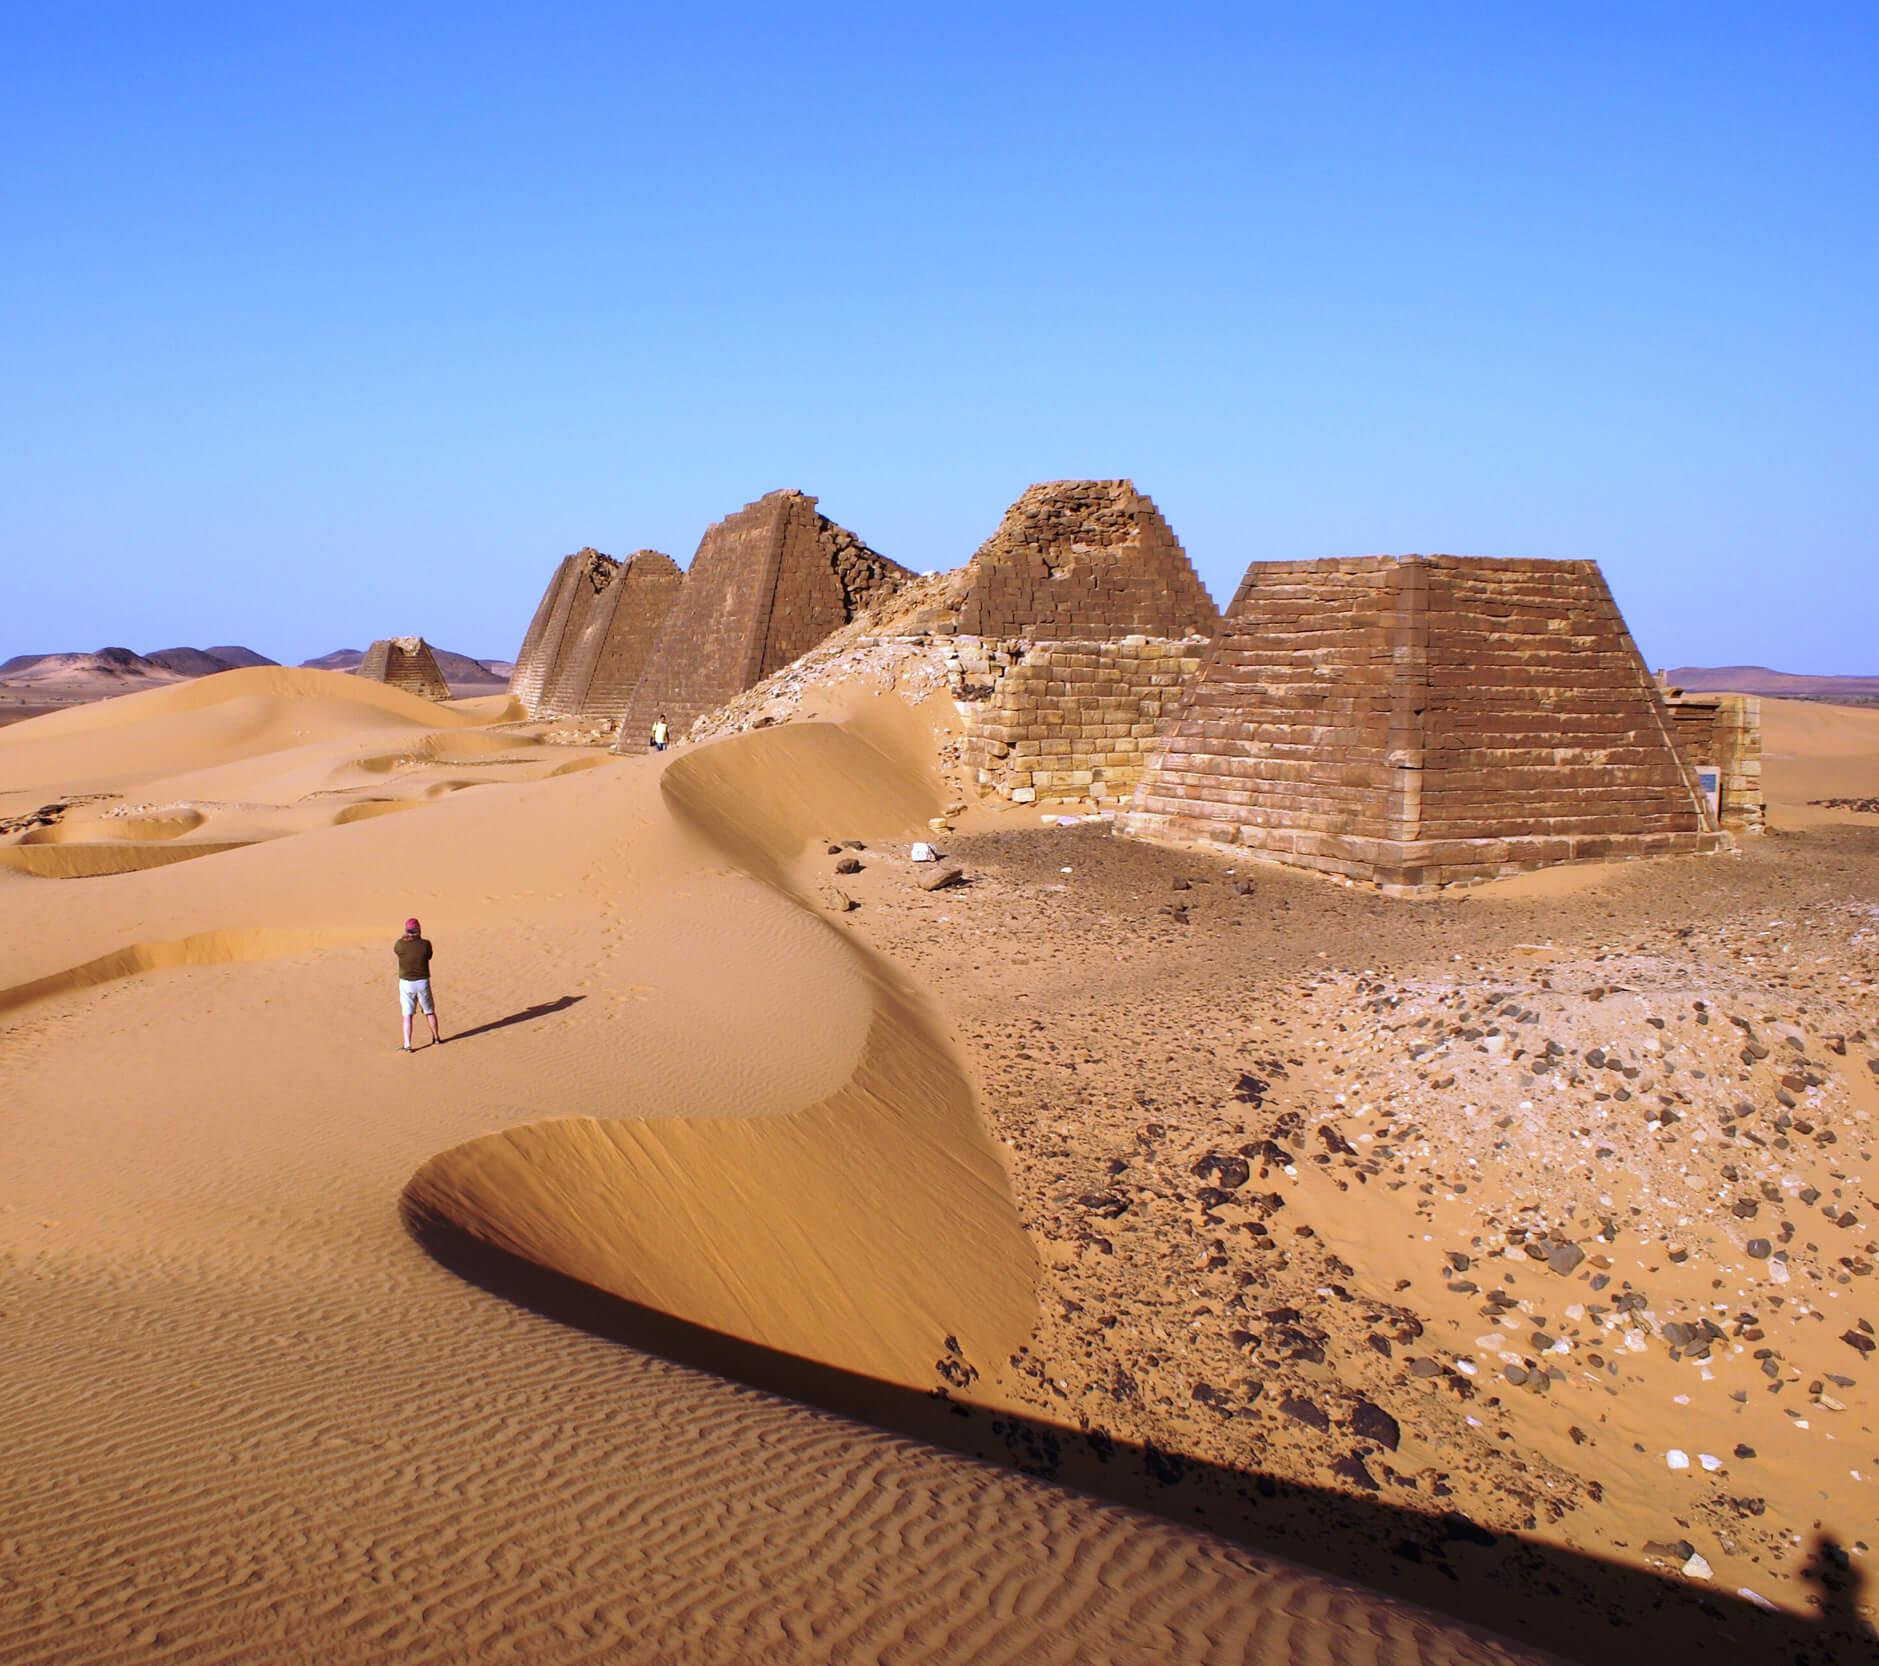 https://bubo.sk/uploads/galleries/7407/lubosfellner_sudan_5-mweroe-uplne-smay-nadhera-spali-sme-medzi-pyramidami.jpg